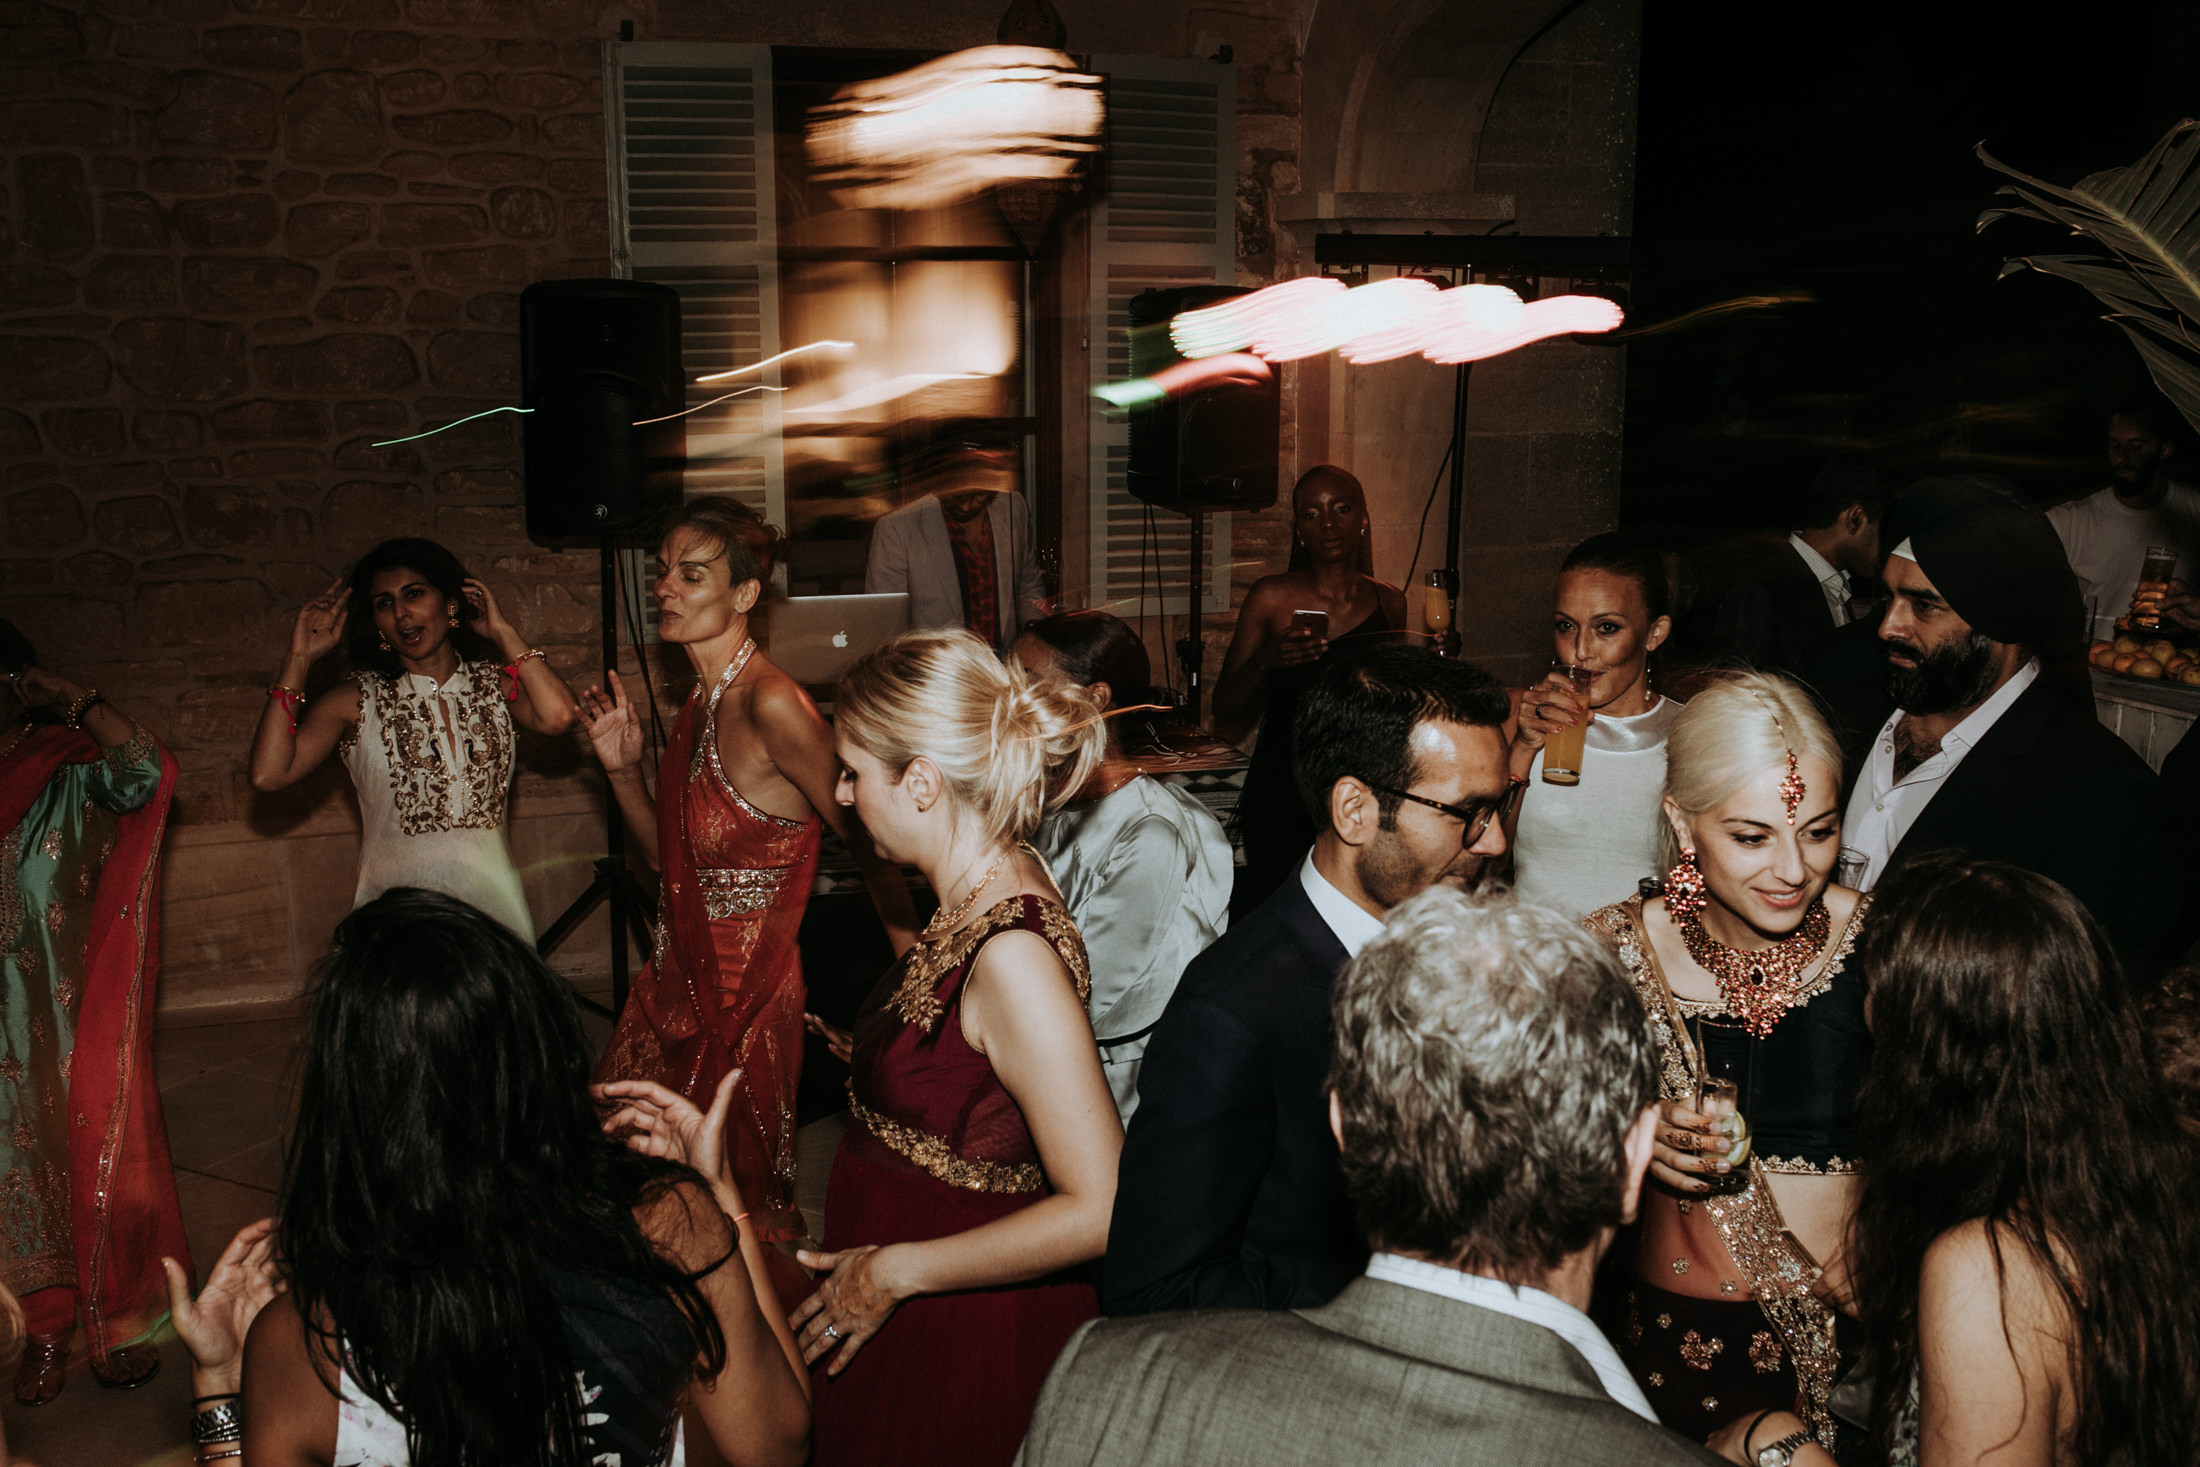 Wedding_Photographer_Mallorca_Daniela-Marquardt_Photography_New_York_Iceland_Tuscany_Santorini_Portugal_Austria_Bavaria_Elopement_Hochzeitsfotograf_AntjeRajat1_52